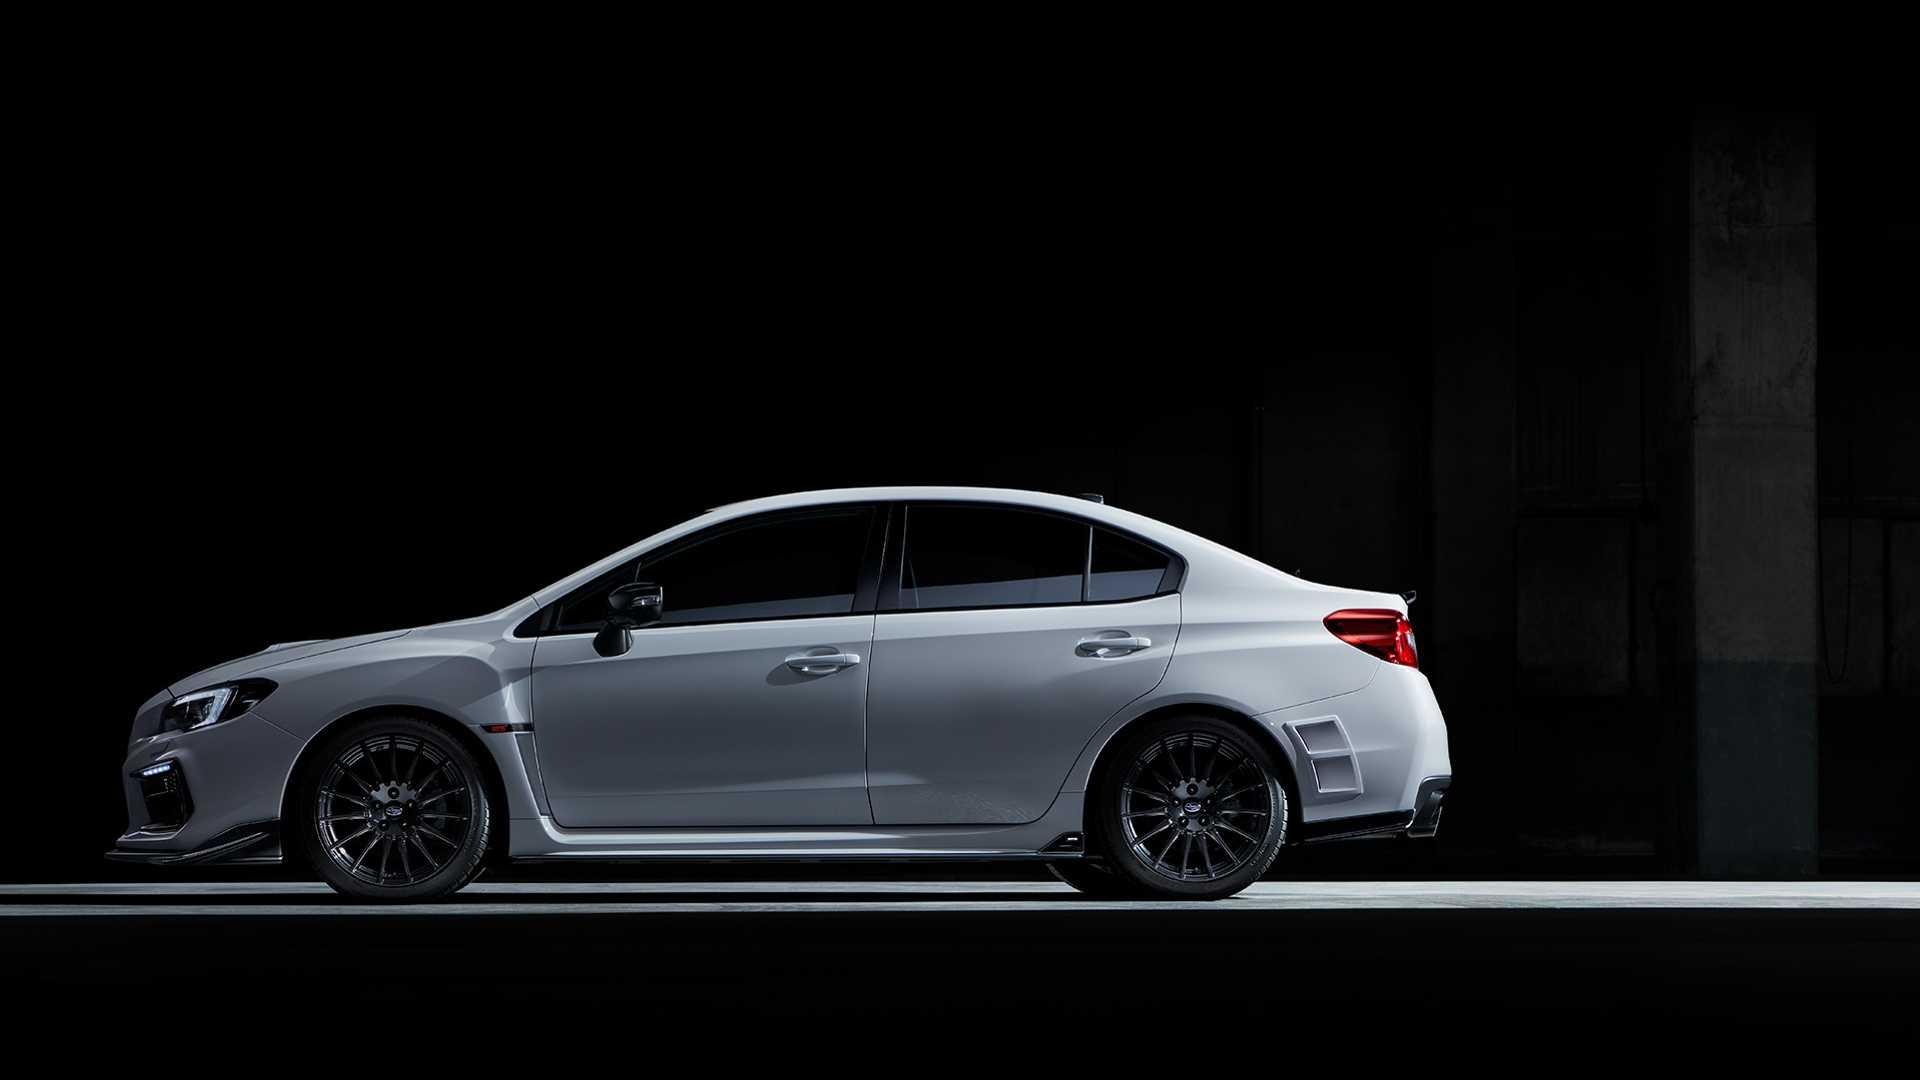 Subaru-WRX-S4-STI-Sport-Sharp-5